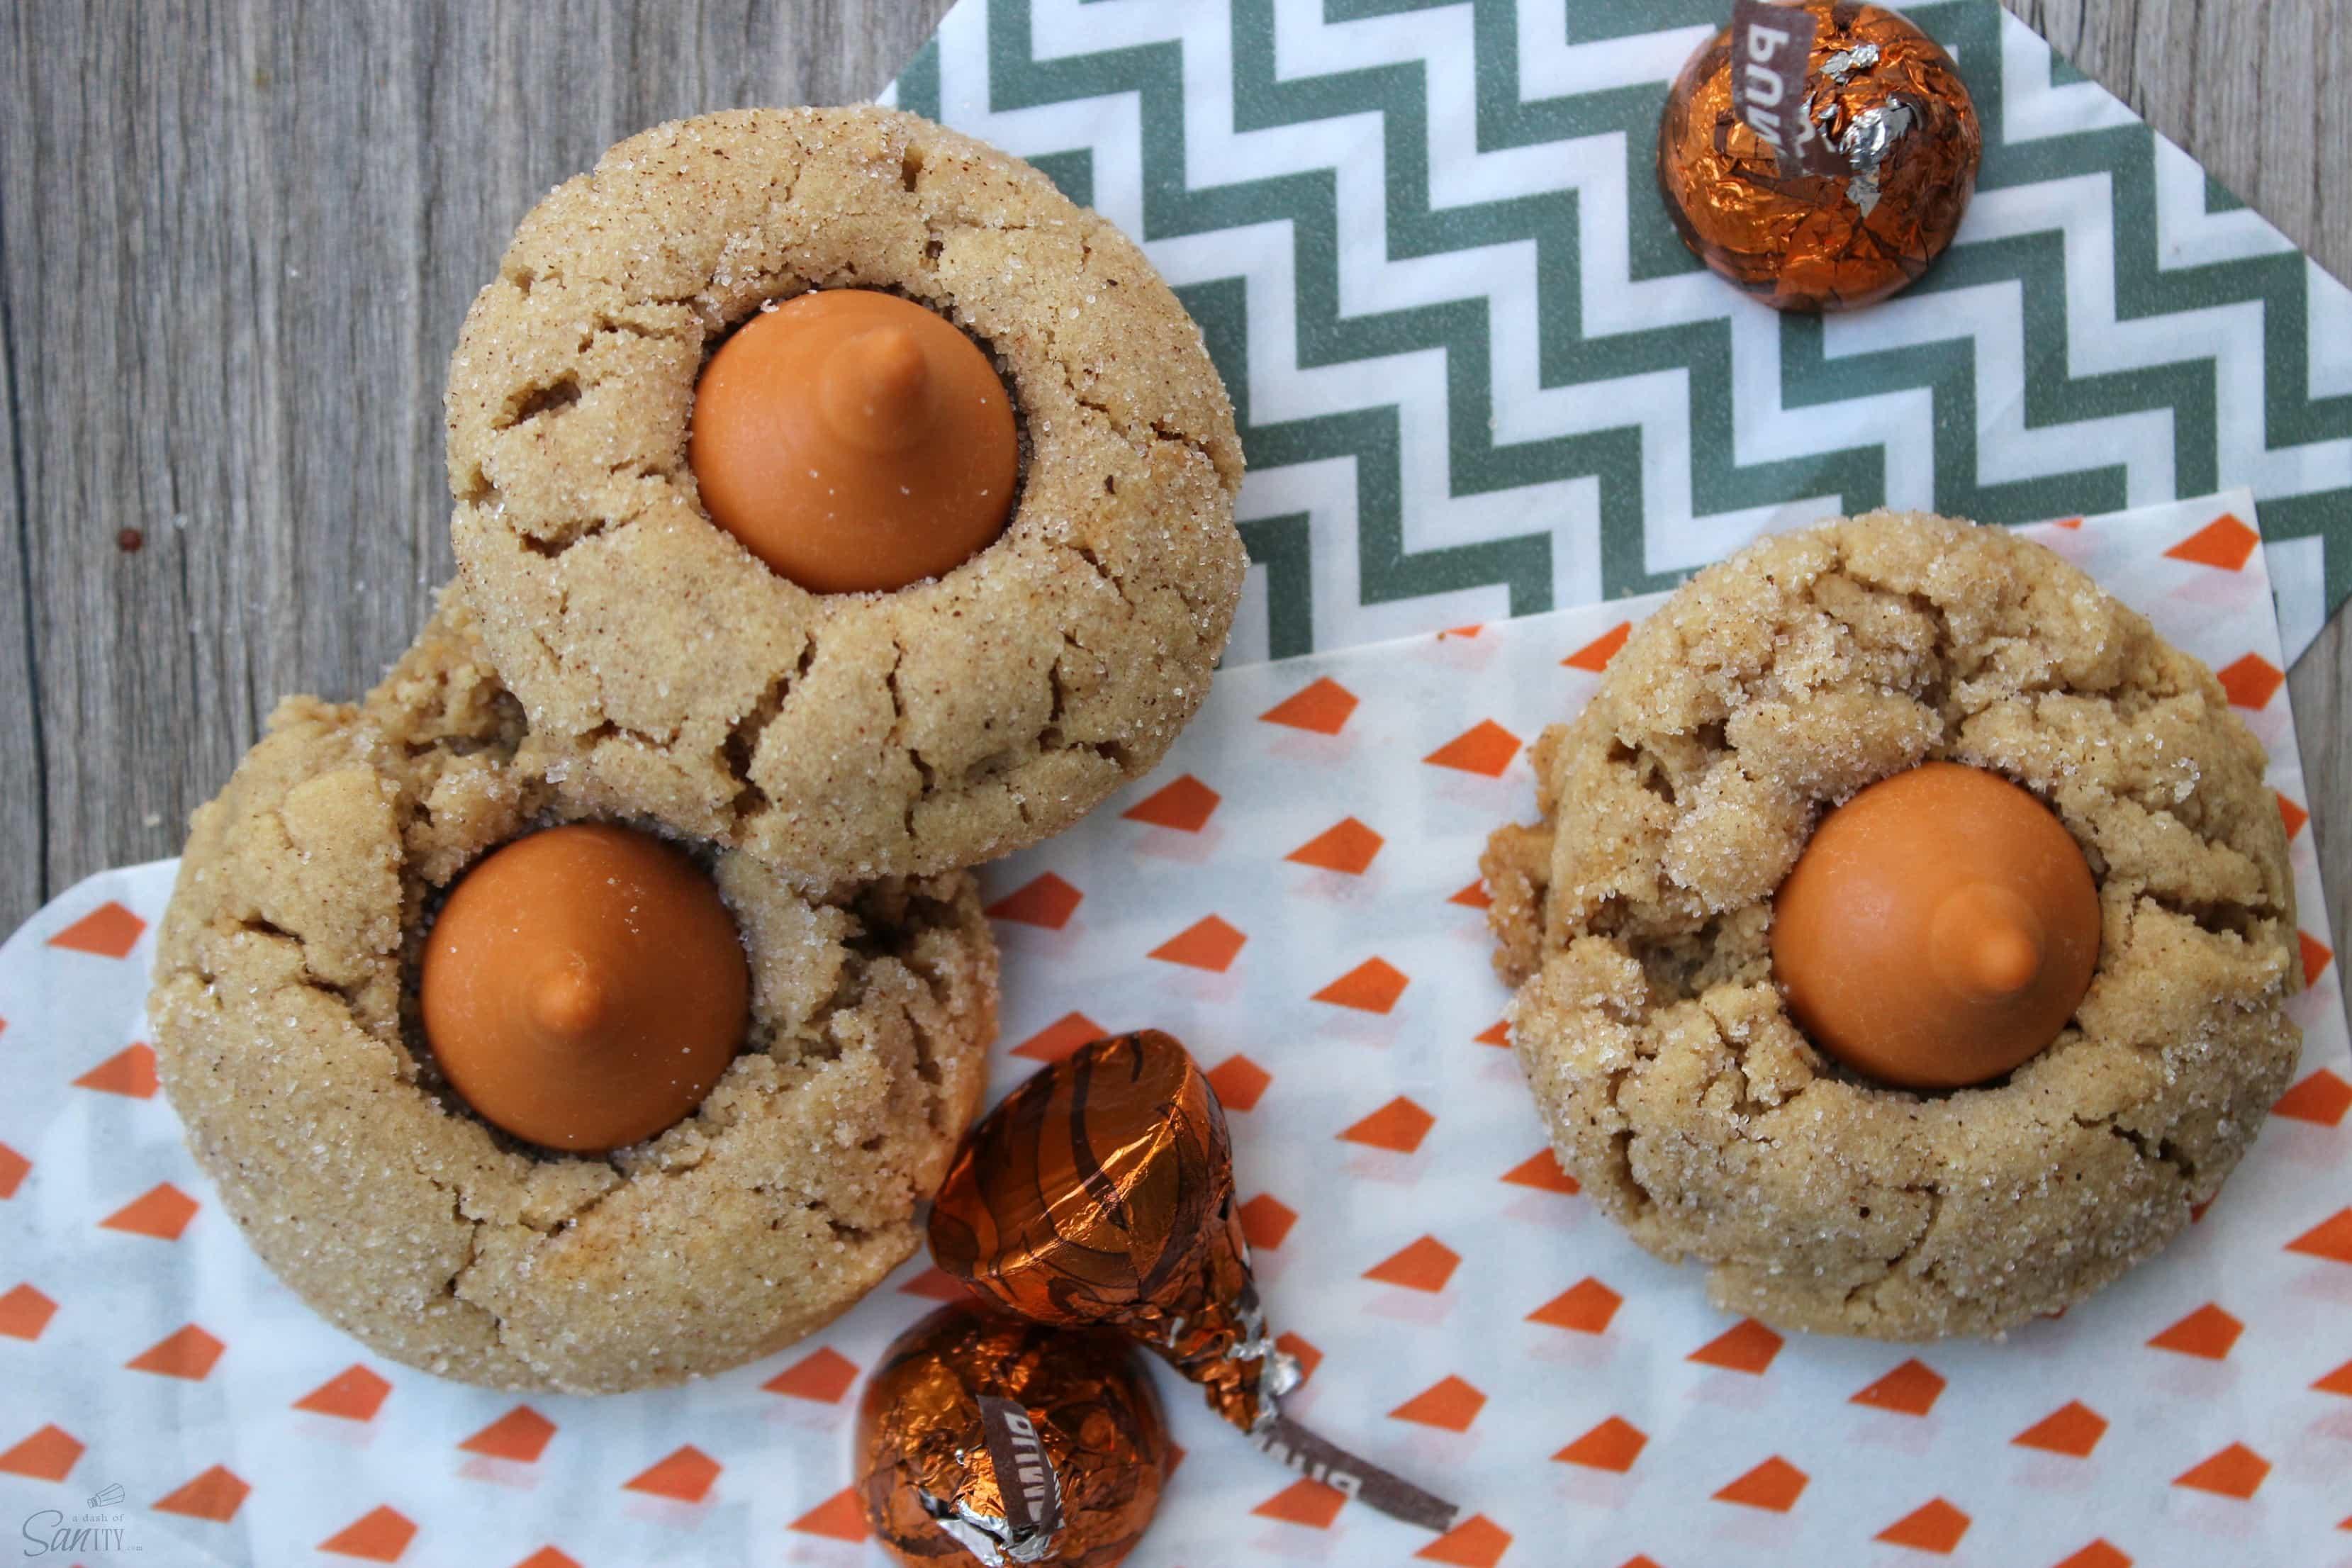 ... pumpkin pie spice seasoning 24 pumpkin spice hershey kisses unwrapped